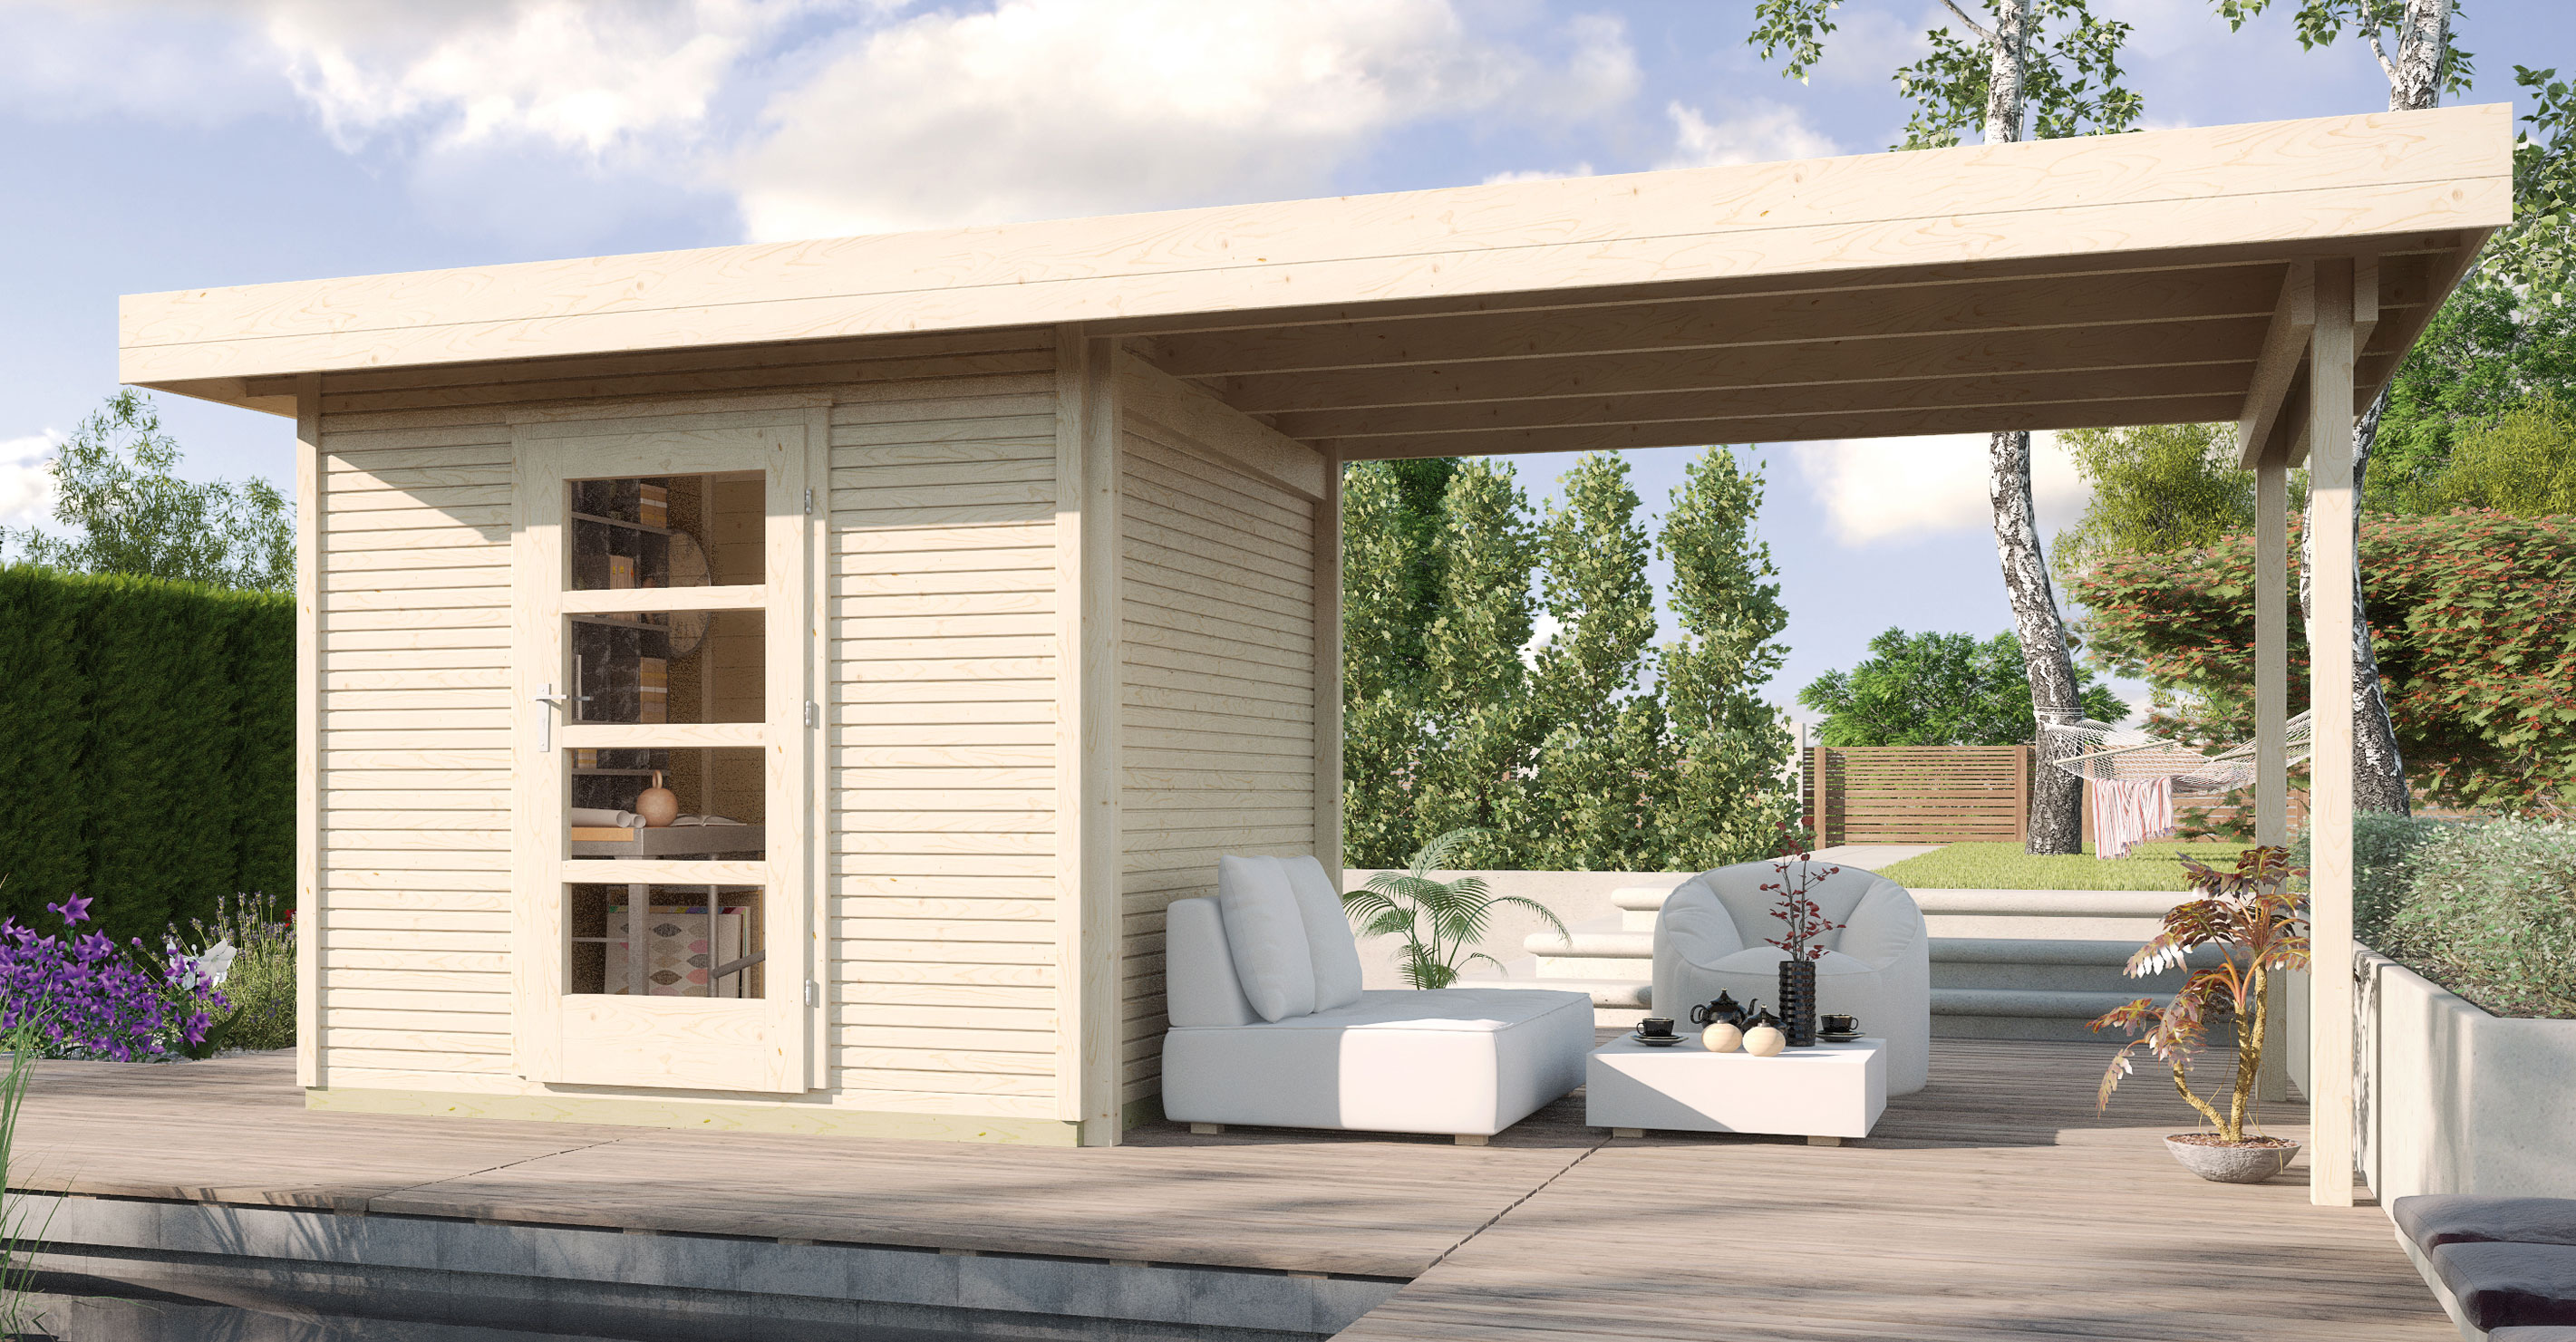 gartenhaus 28mm weka designhaus wekaline 172b gr 2 natur 569x316cm bei. Black Bedroom Furniture Sets. Home Design Ideas